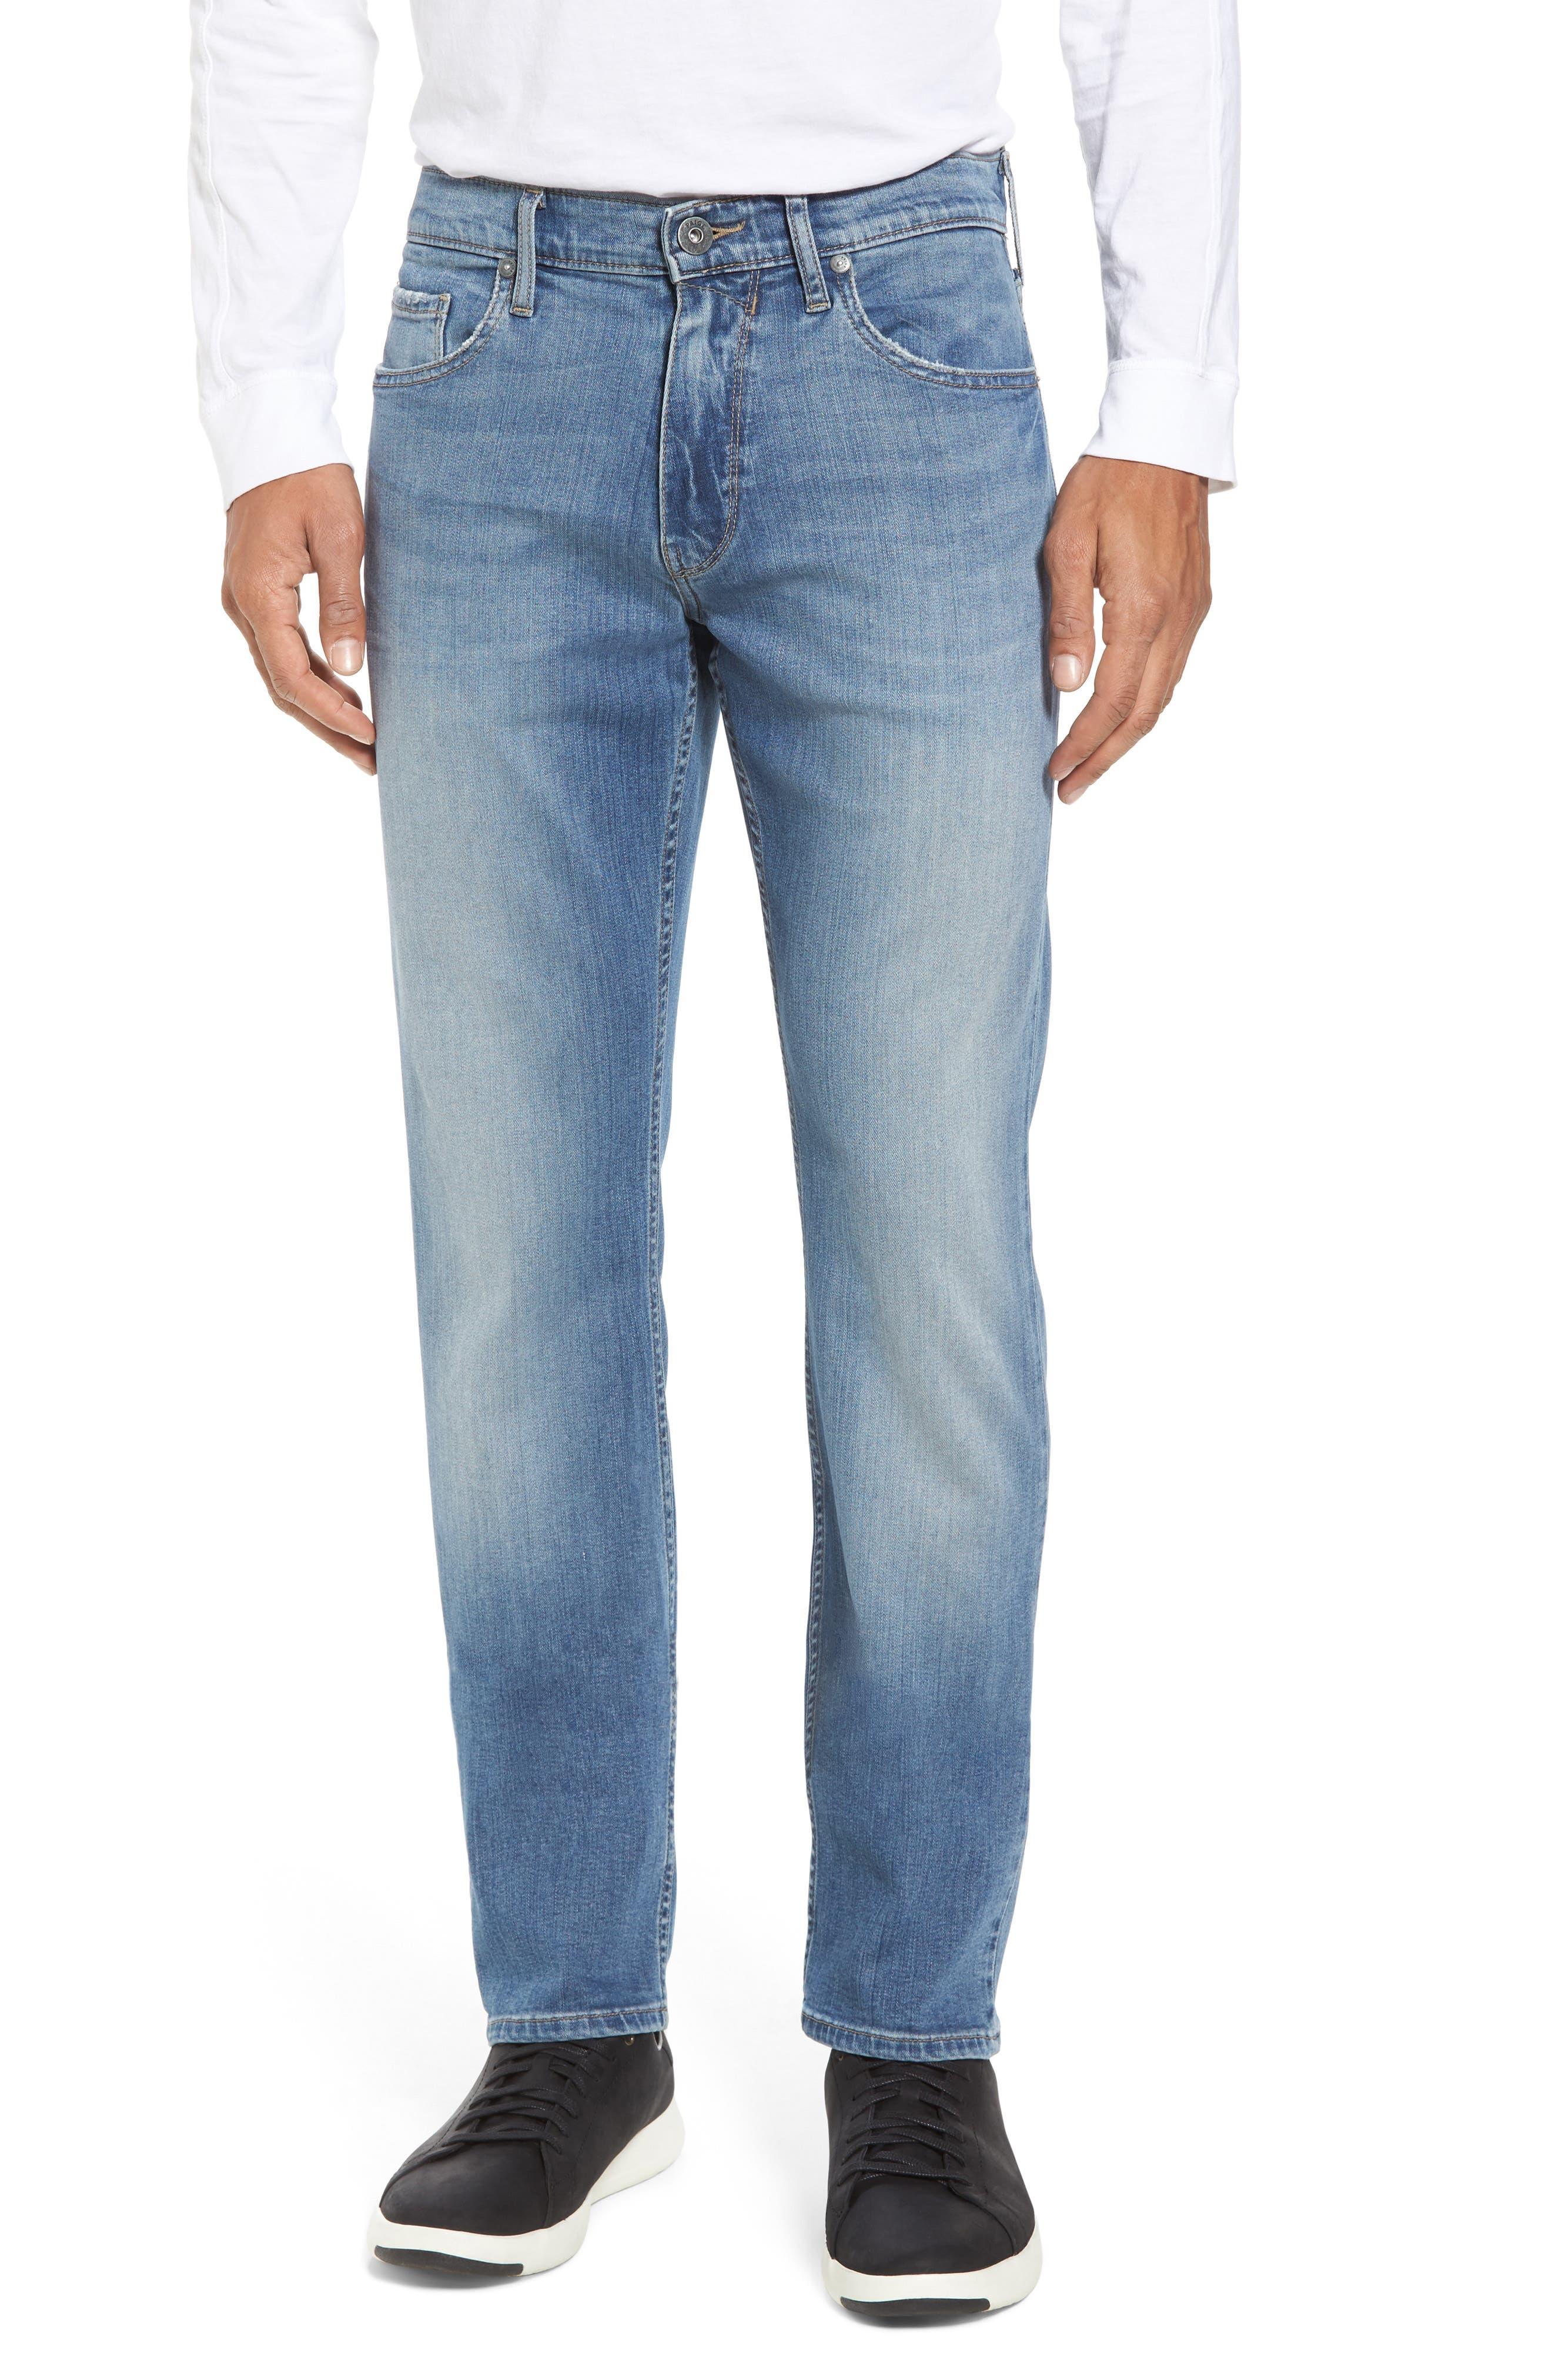 Transcend - Federal Slim Straight Fit Jeans,                         Main,                         color, Oakland